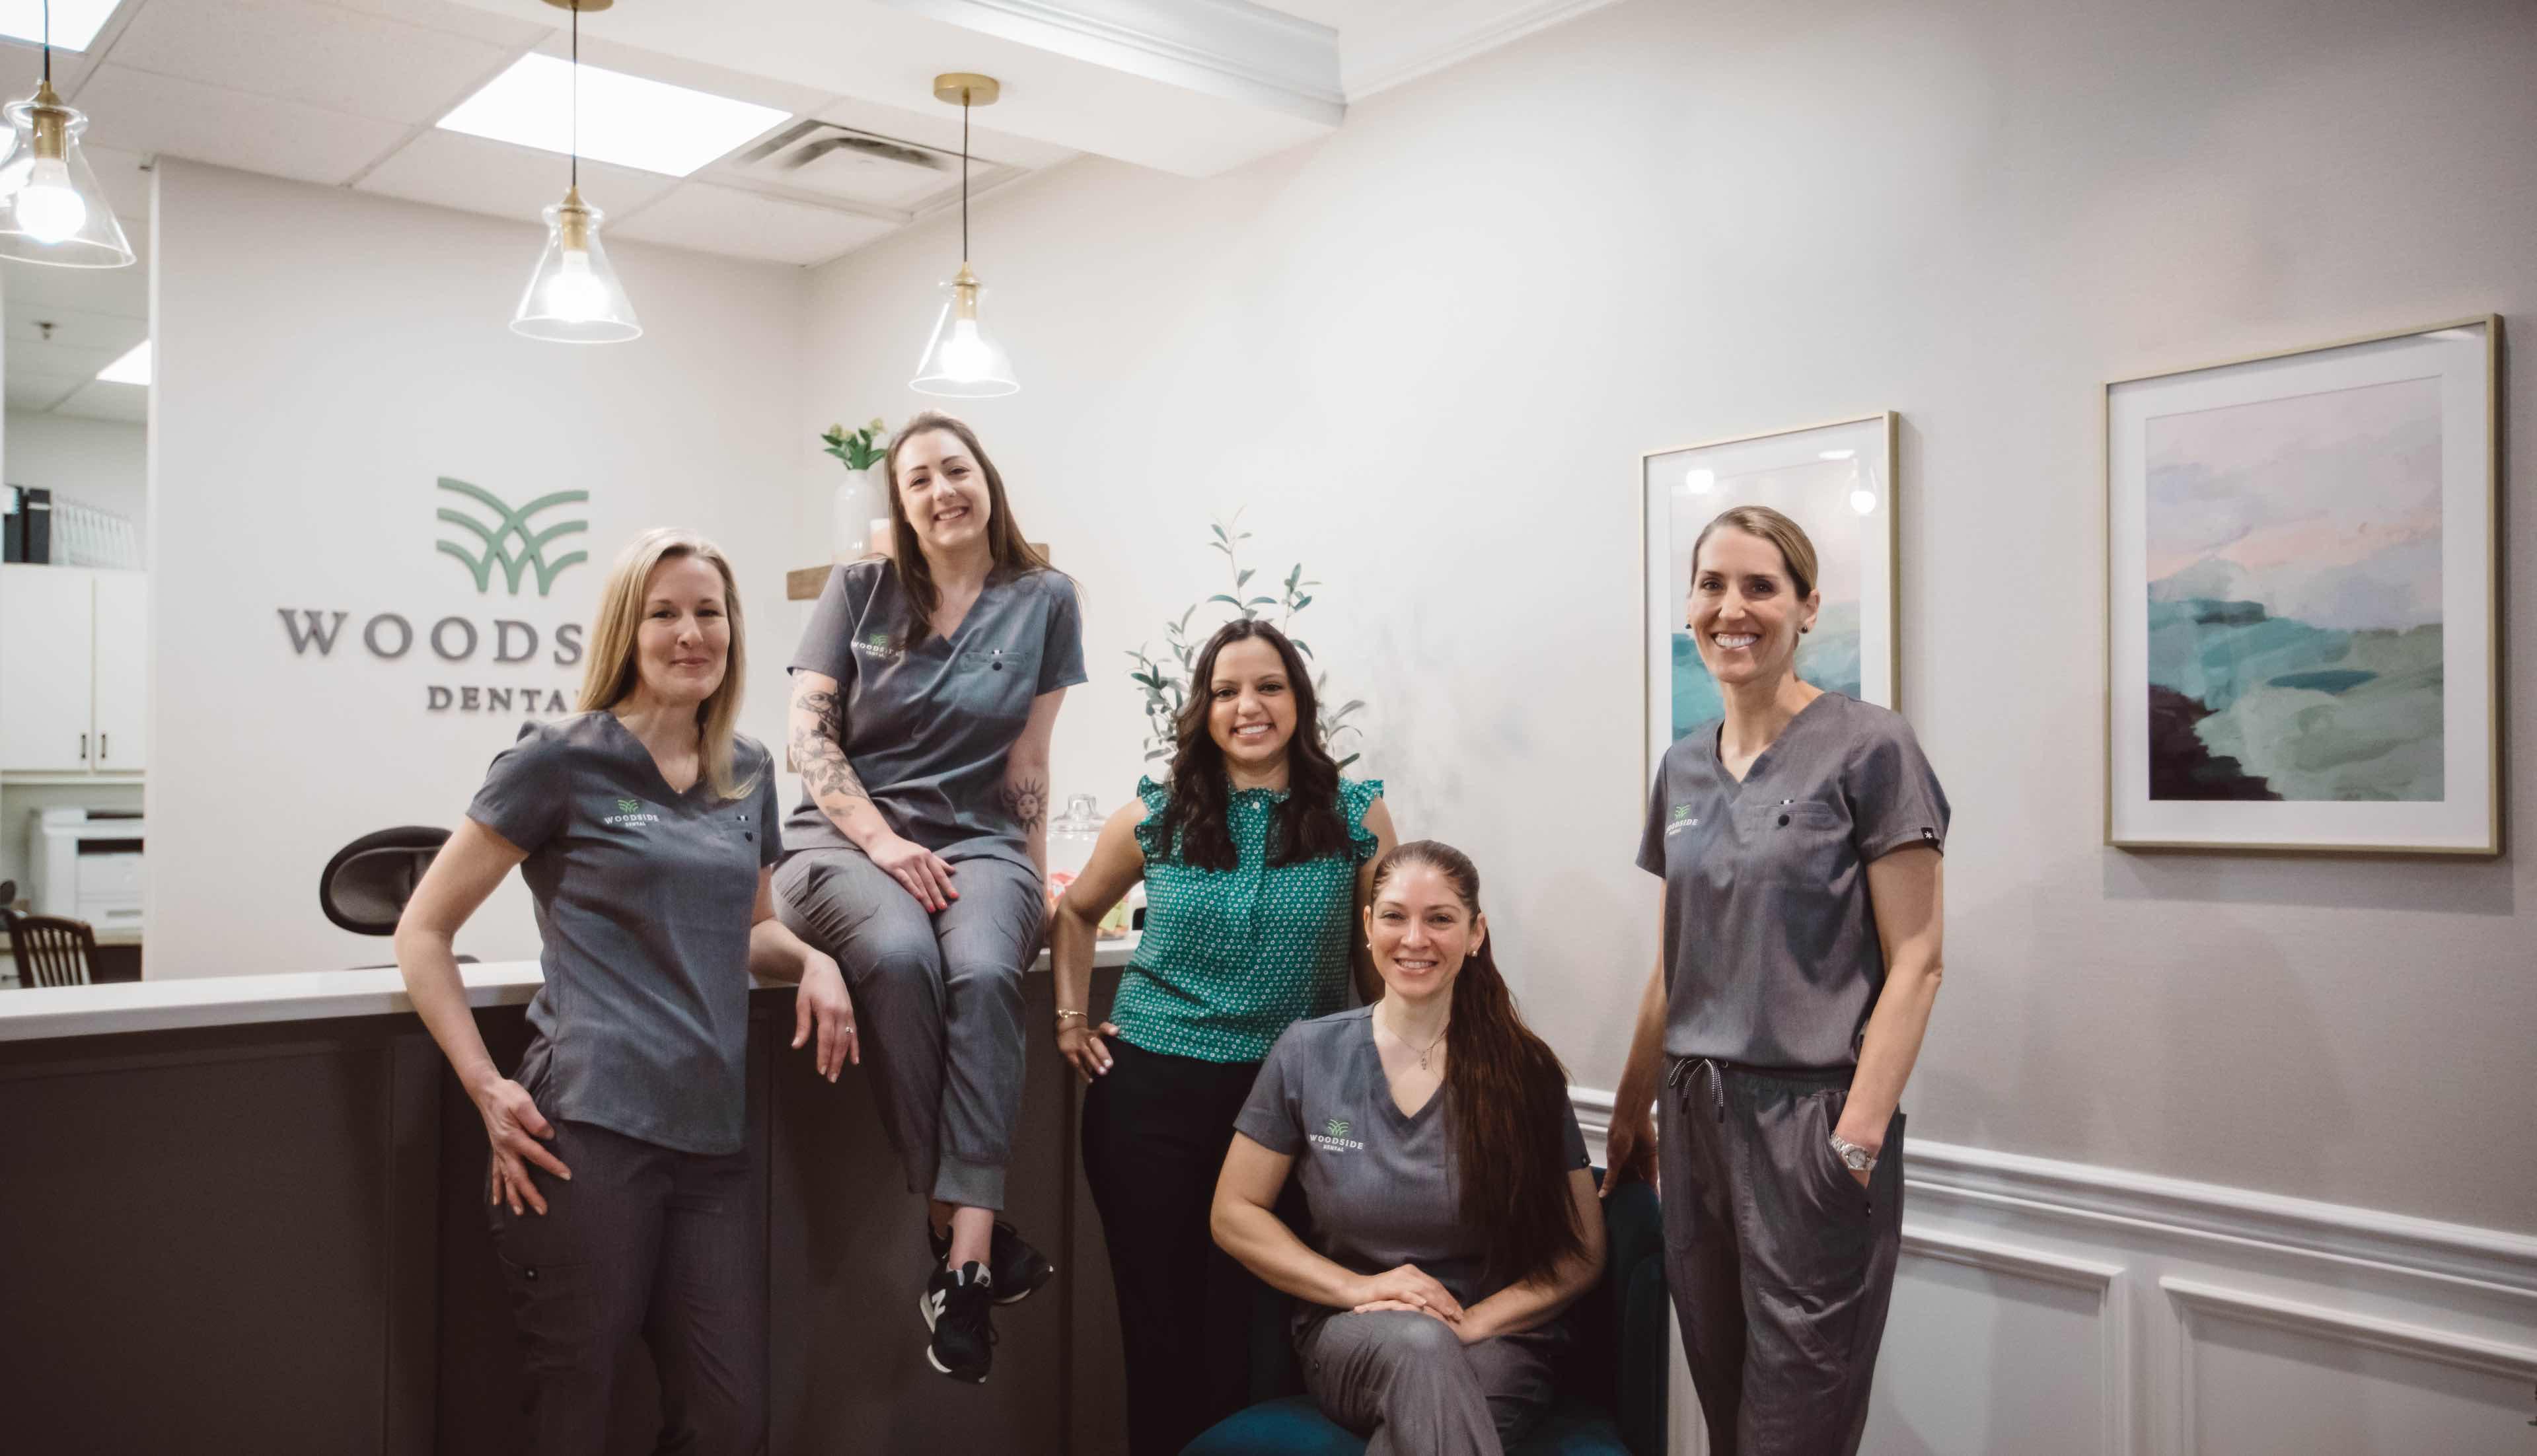 Photo of the Woodside Dental team